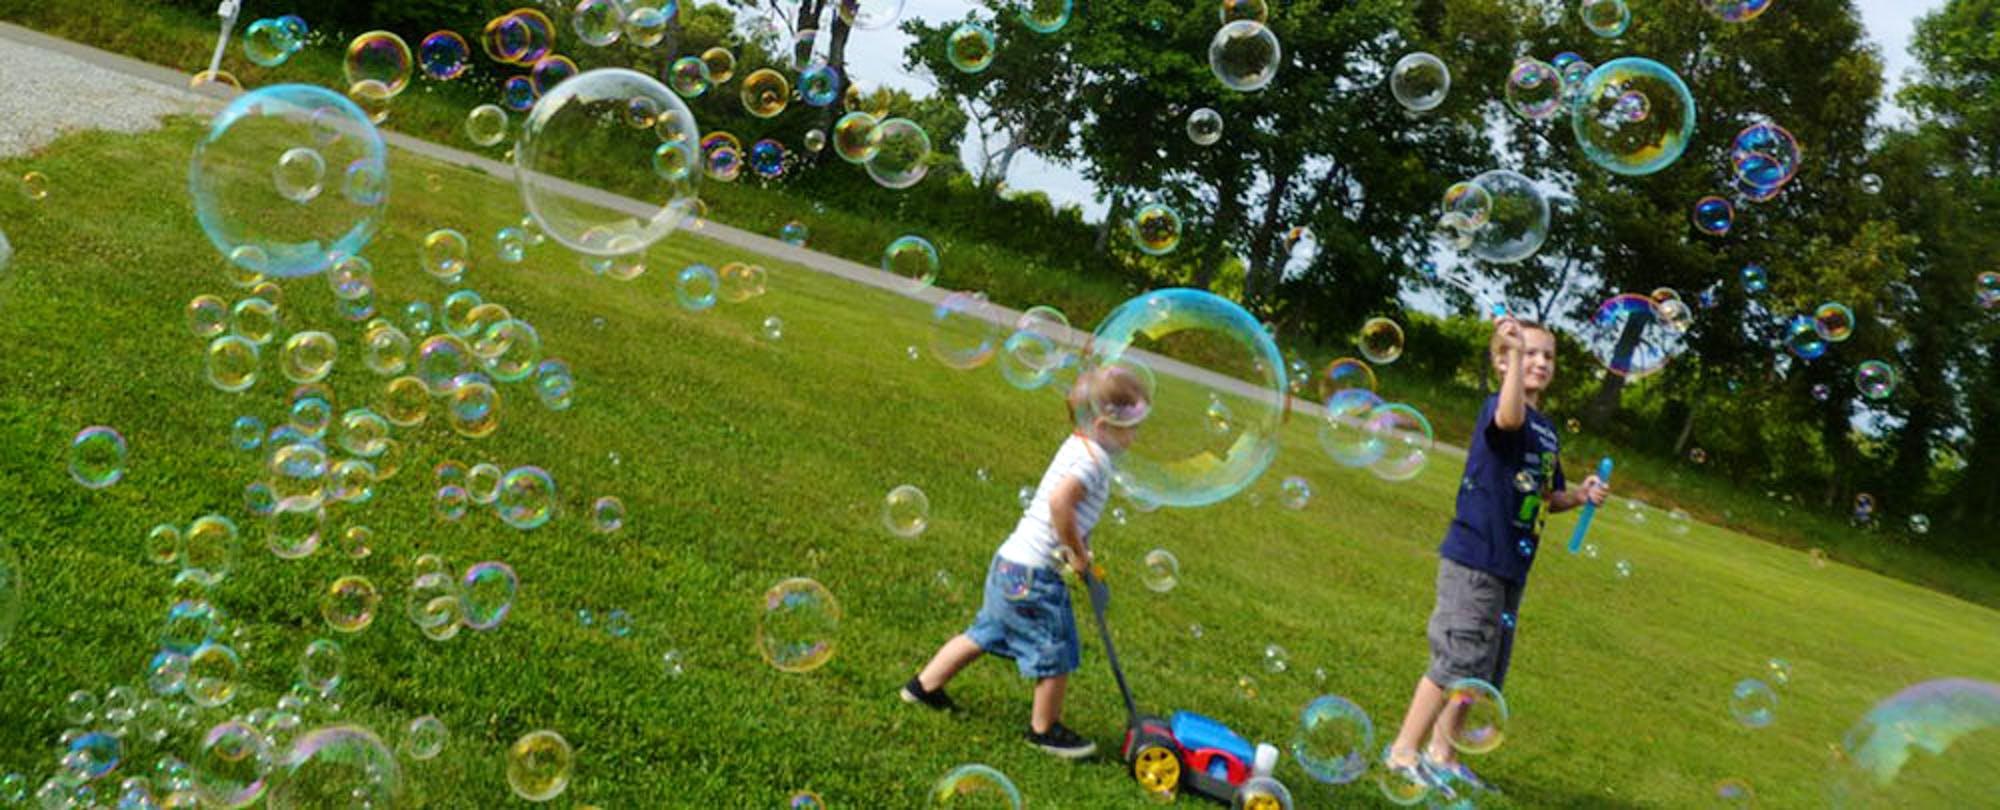 Is the Edtech Bubble Bursting? EdSurge Podcast, Week of Mar 30 - Apr 3